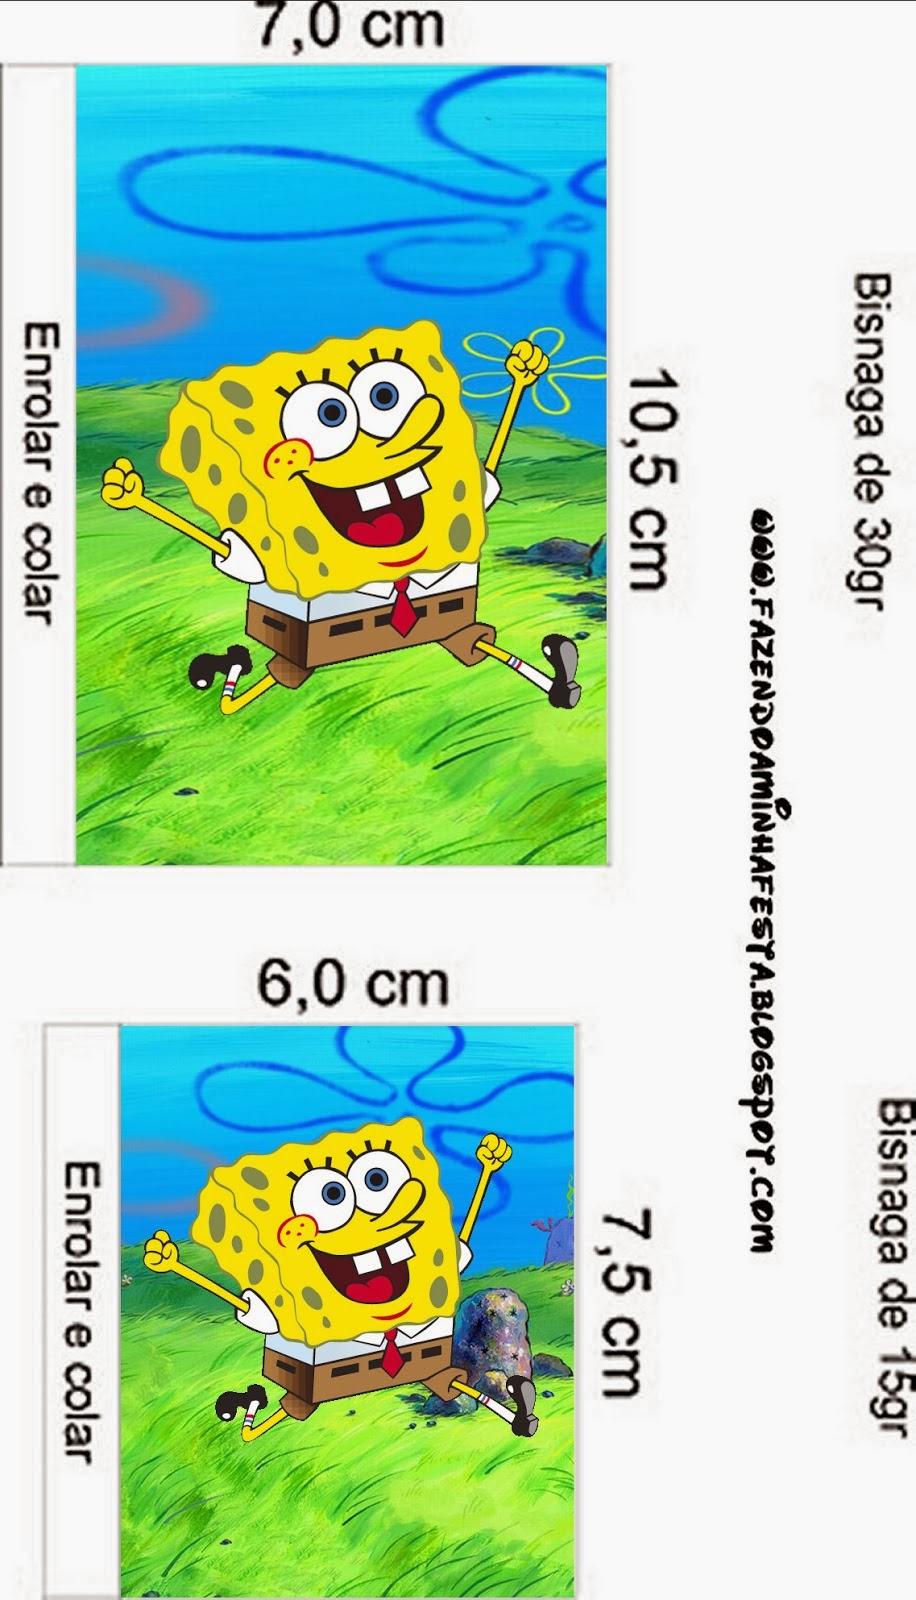 spongebob squarepants free printable candy bar labels is it